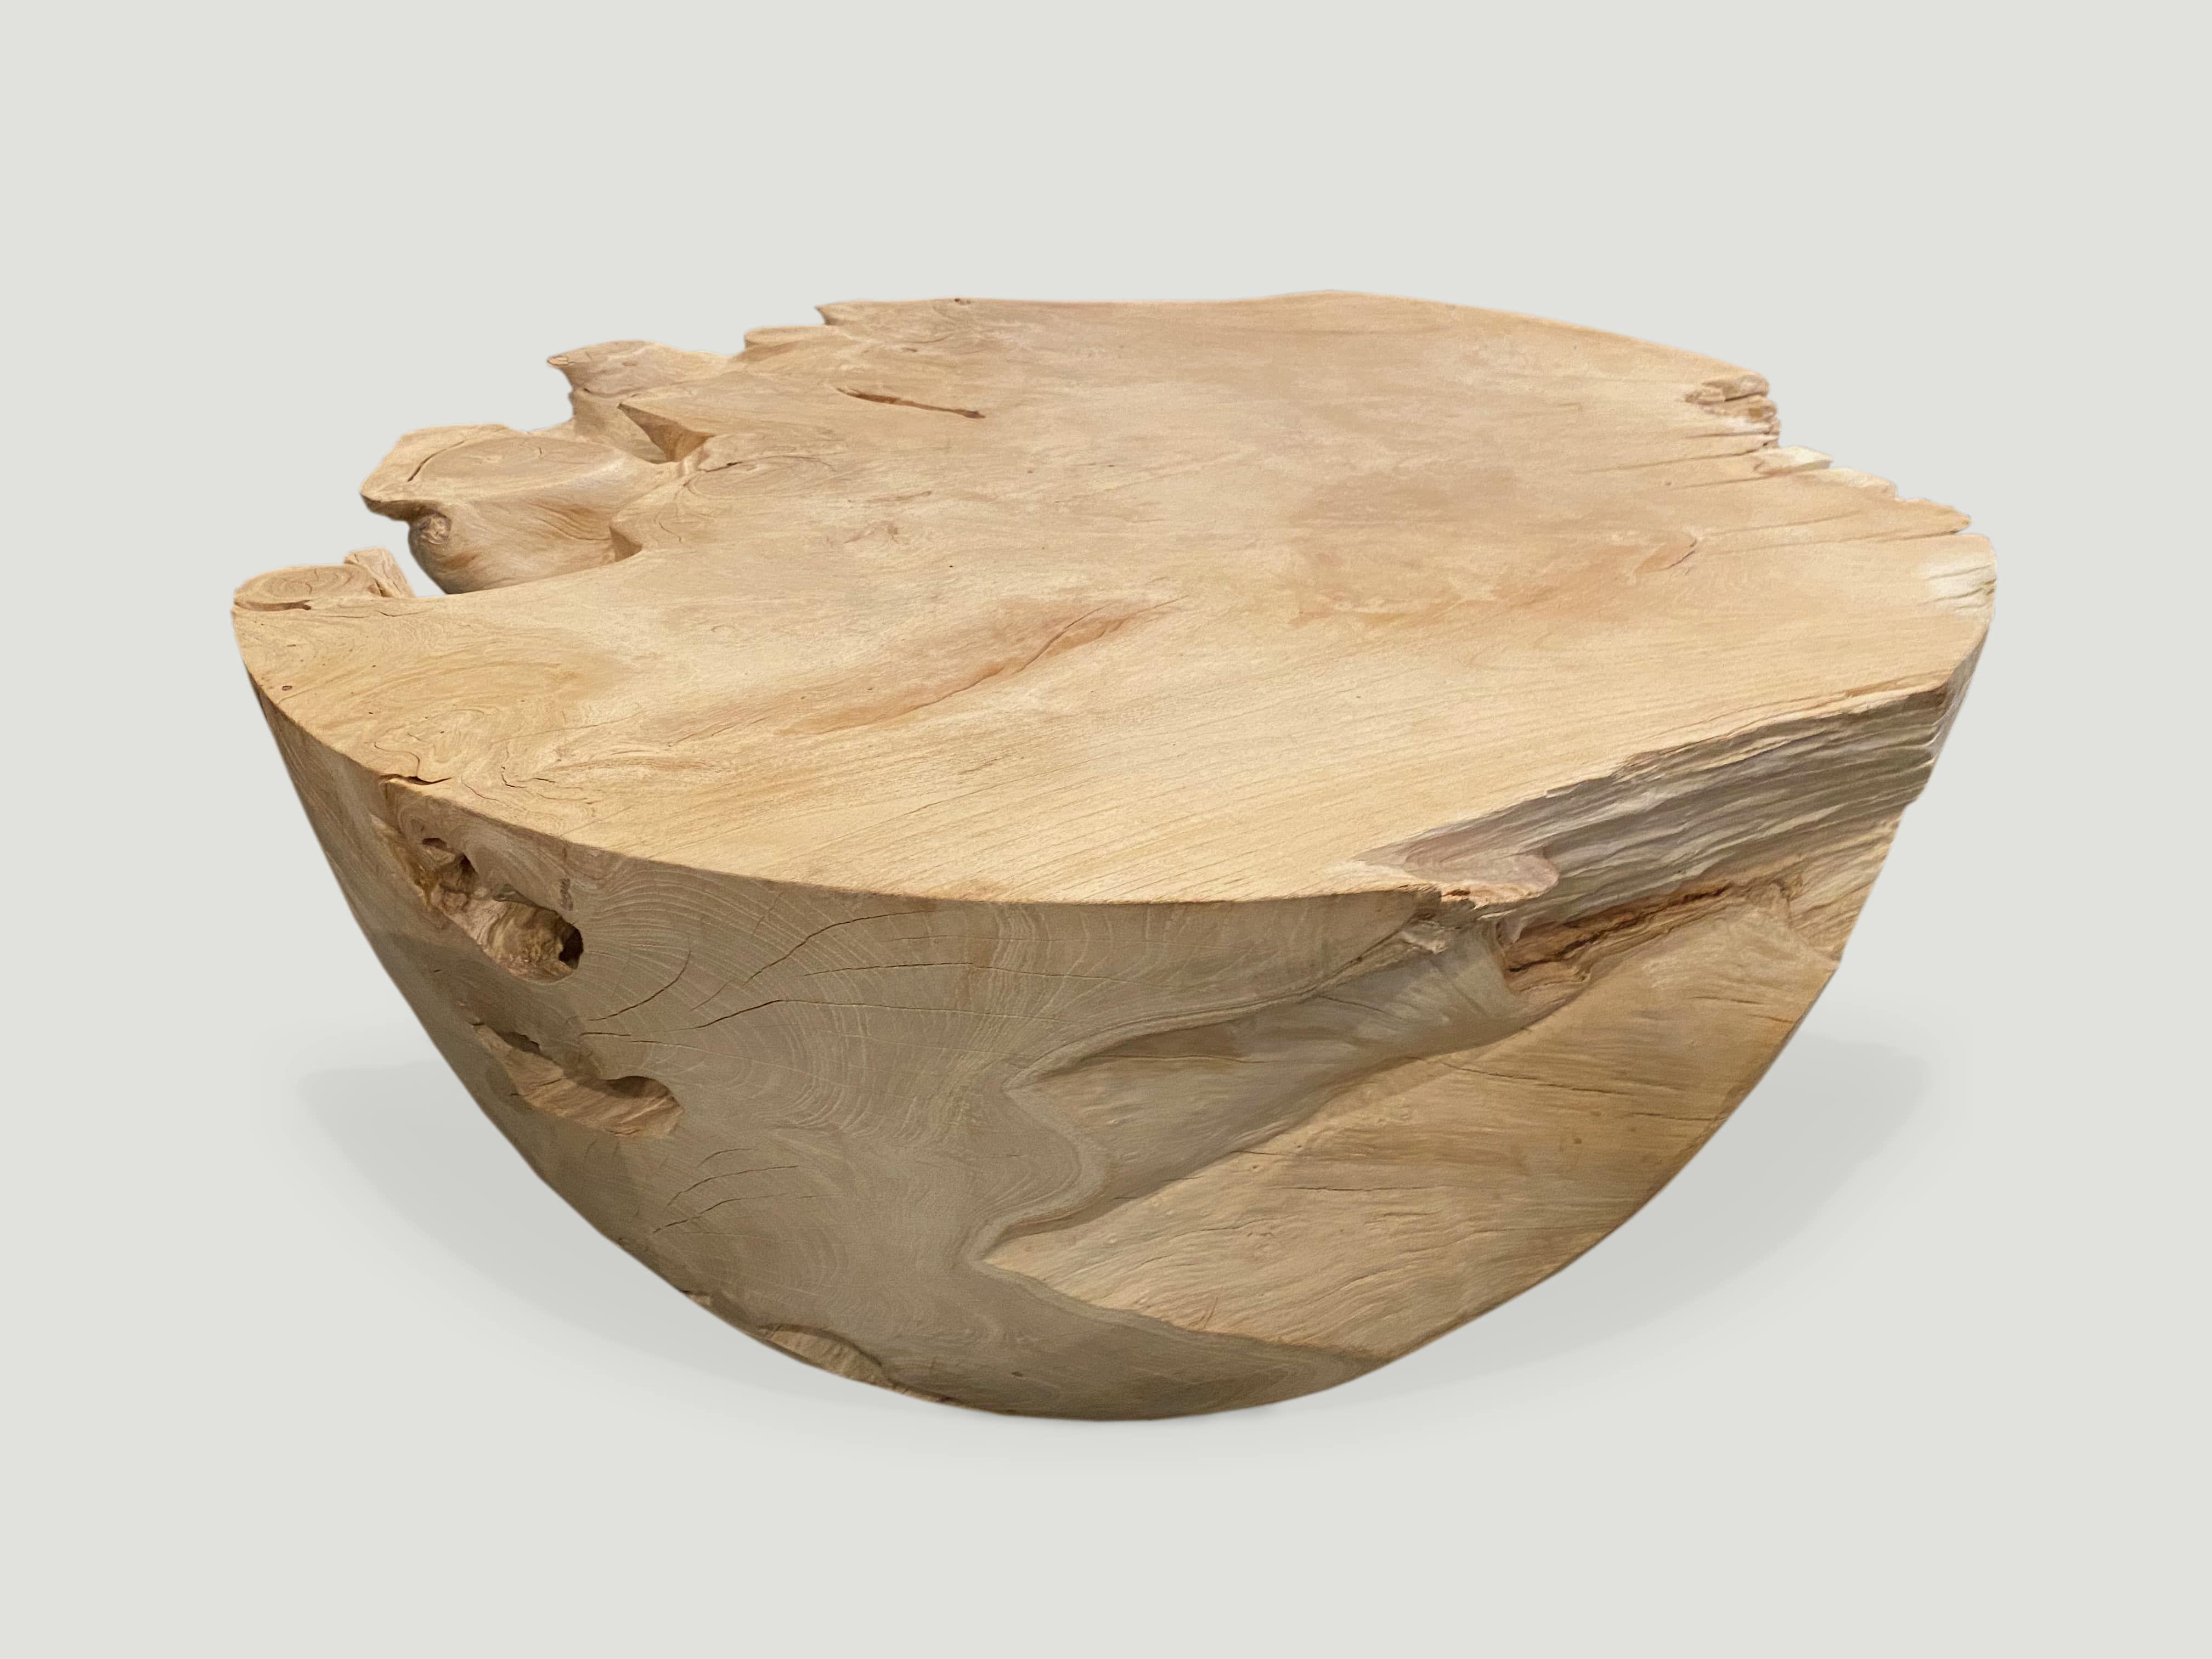 Round Bleached Teak Coffee Table 8stk In 2020 Coffee Table Wood